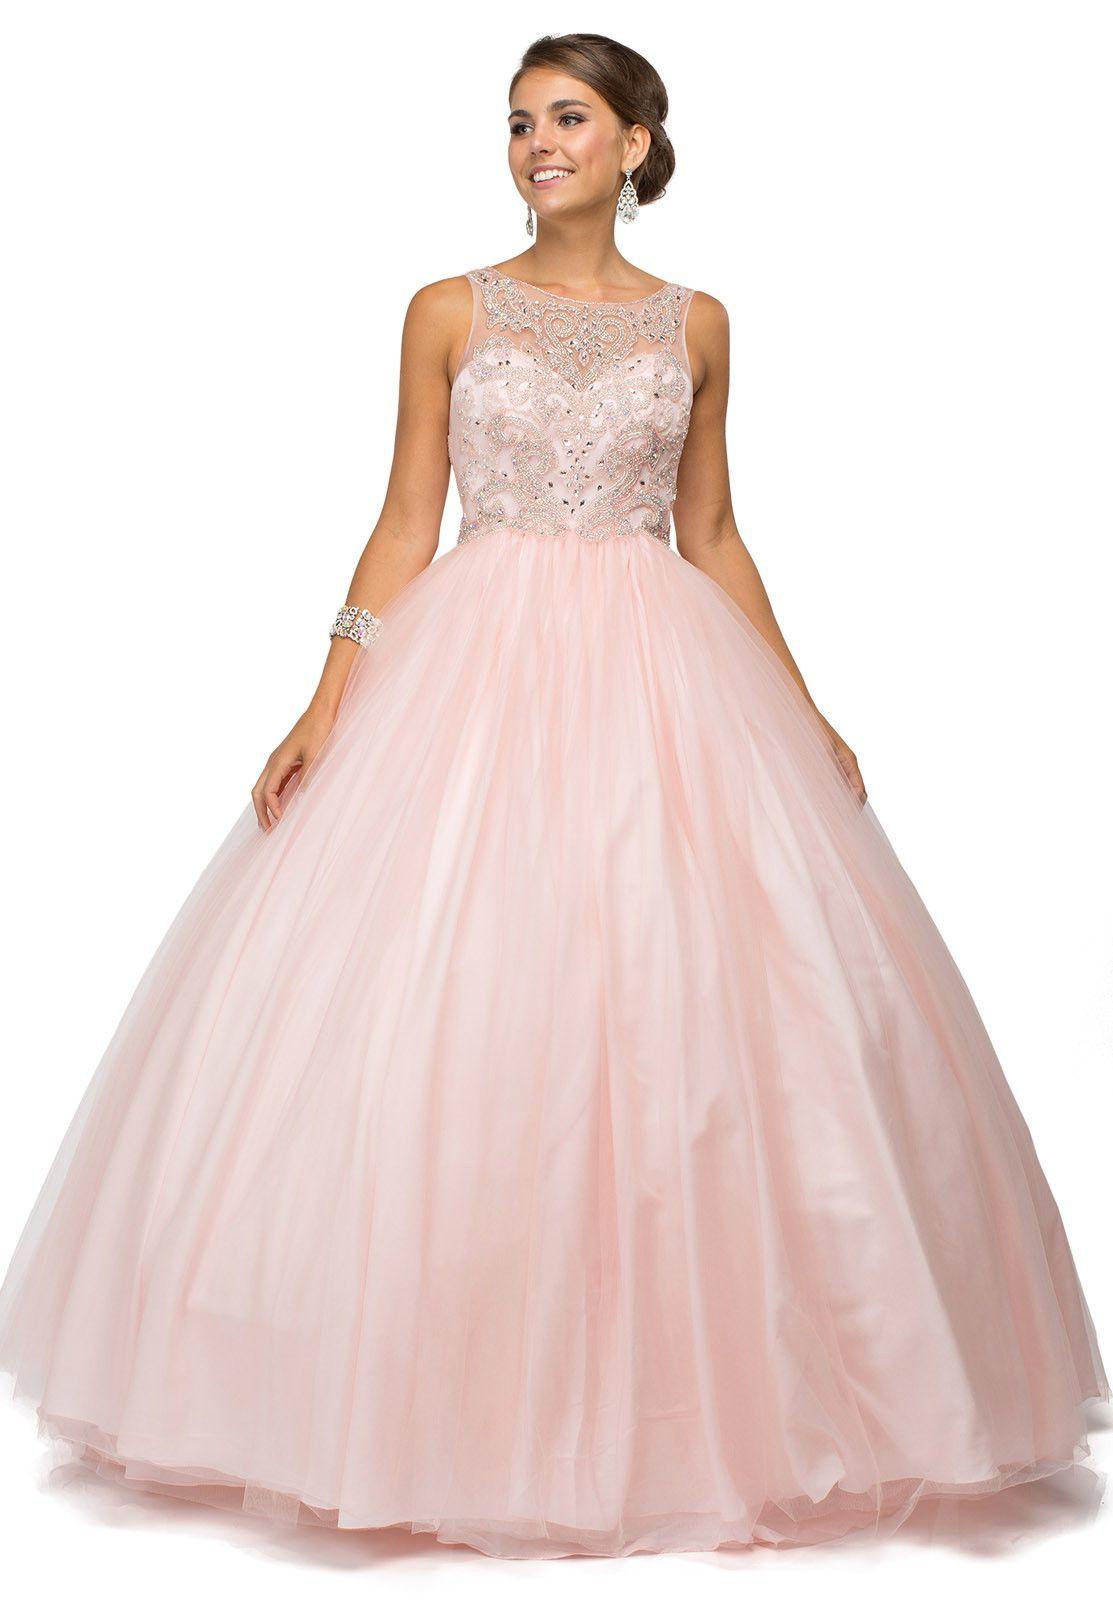 Blush Rhinestones Bodice Sleeveless Lace Up Back Satin Ball Gown ...